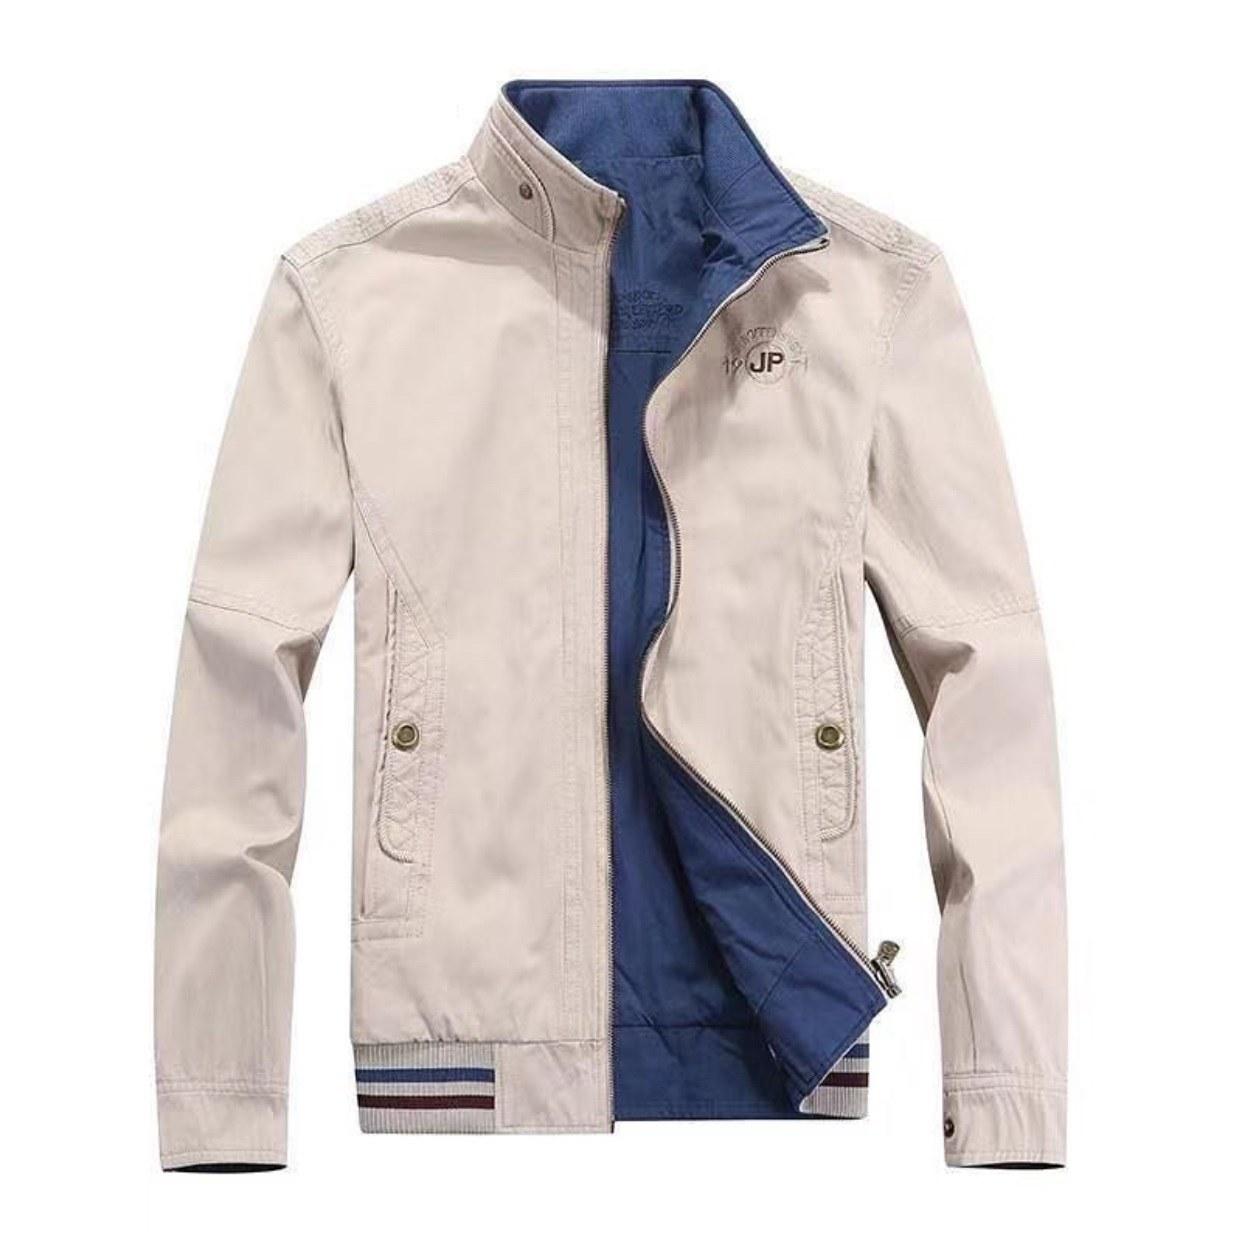 کاپشن کتان مردانه دورو مارک جیپ سفید آبی